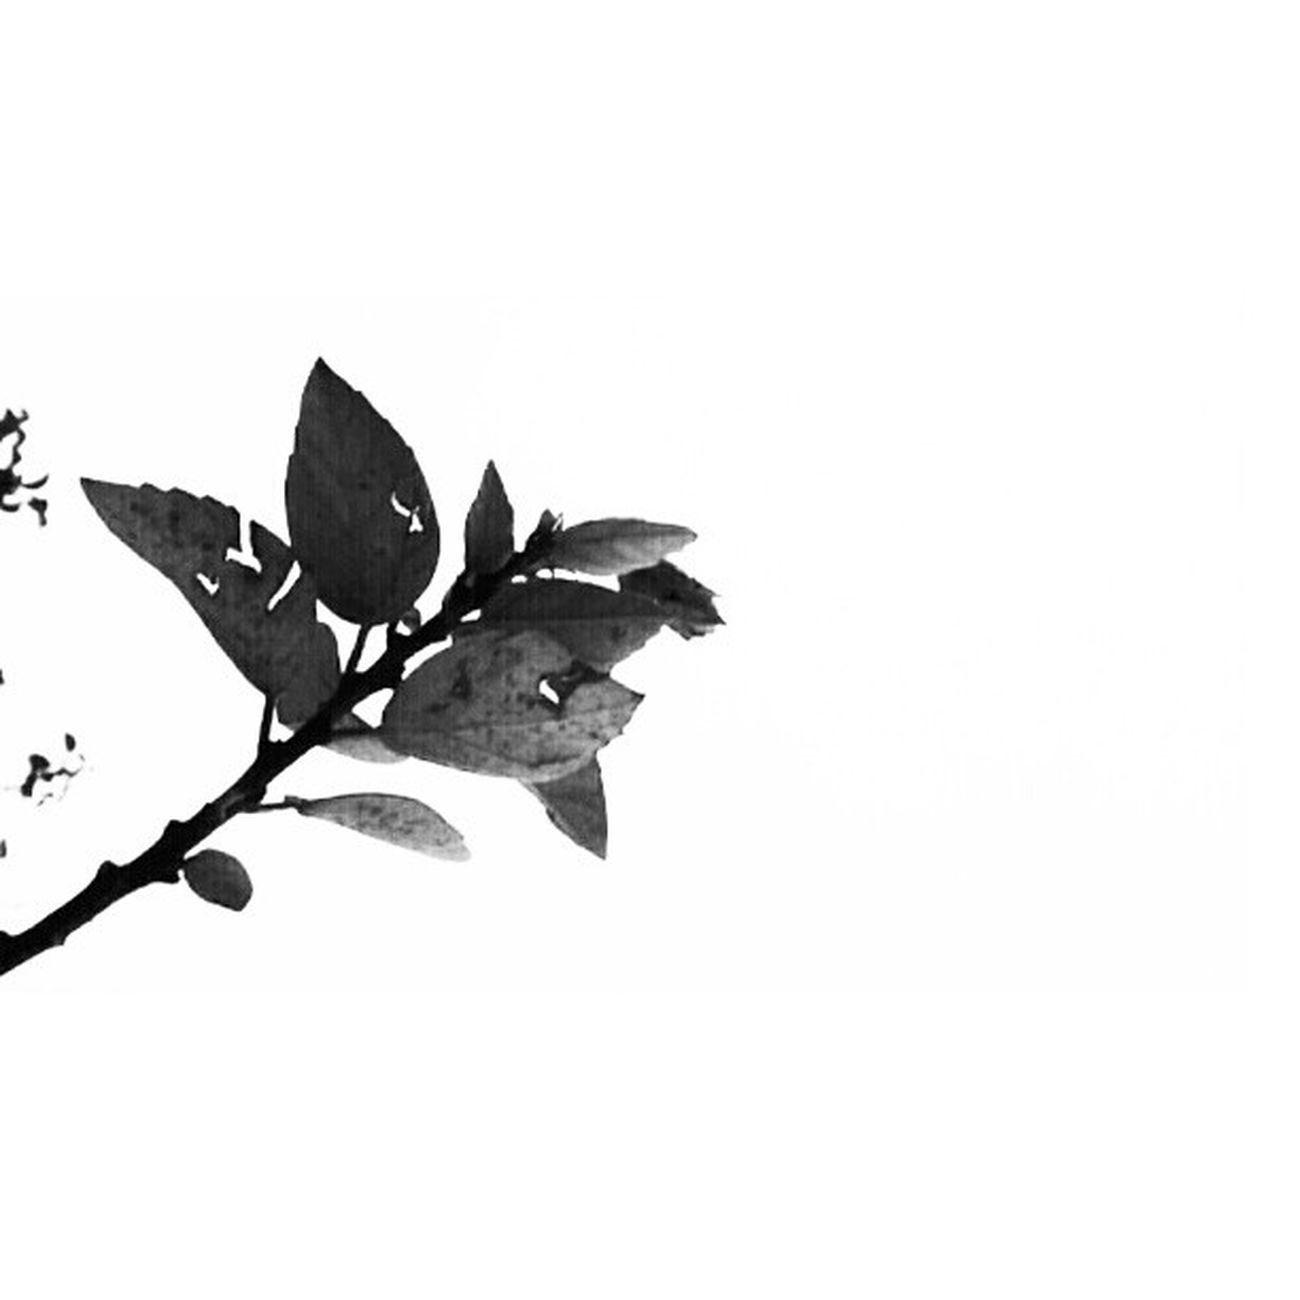 Tree Lookabove Lookingup Dry nature bwoftheday bw blackandwhite blackandwhiteonly bnw bnw_society bwstyles_gf blackandwhitephotography minimalism minimalobsession lessismore grow up monochrome israel_times_bw igersisrael photography pictureoftheday igminimal implus_daily statigram all_shots